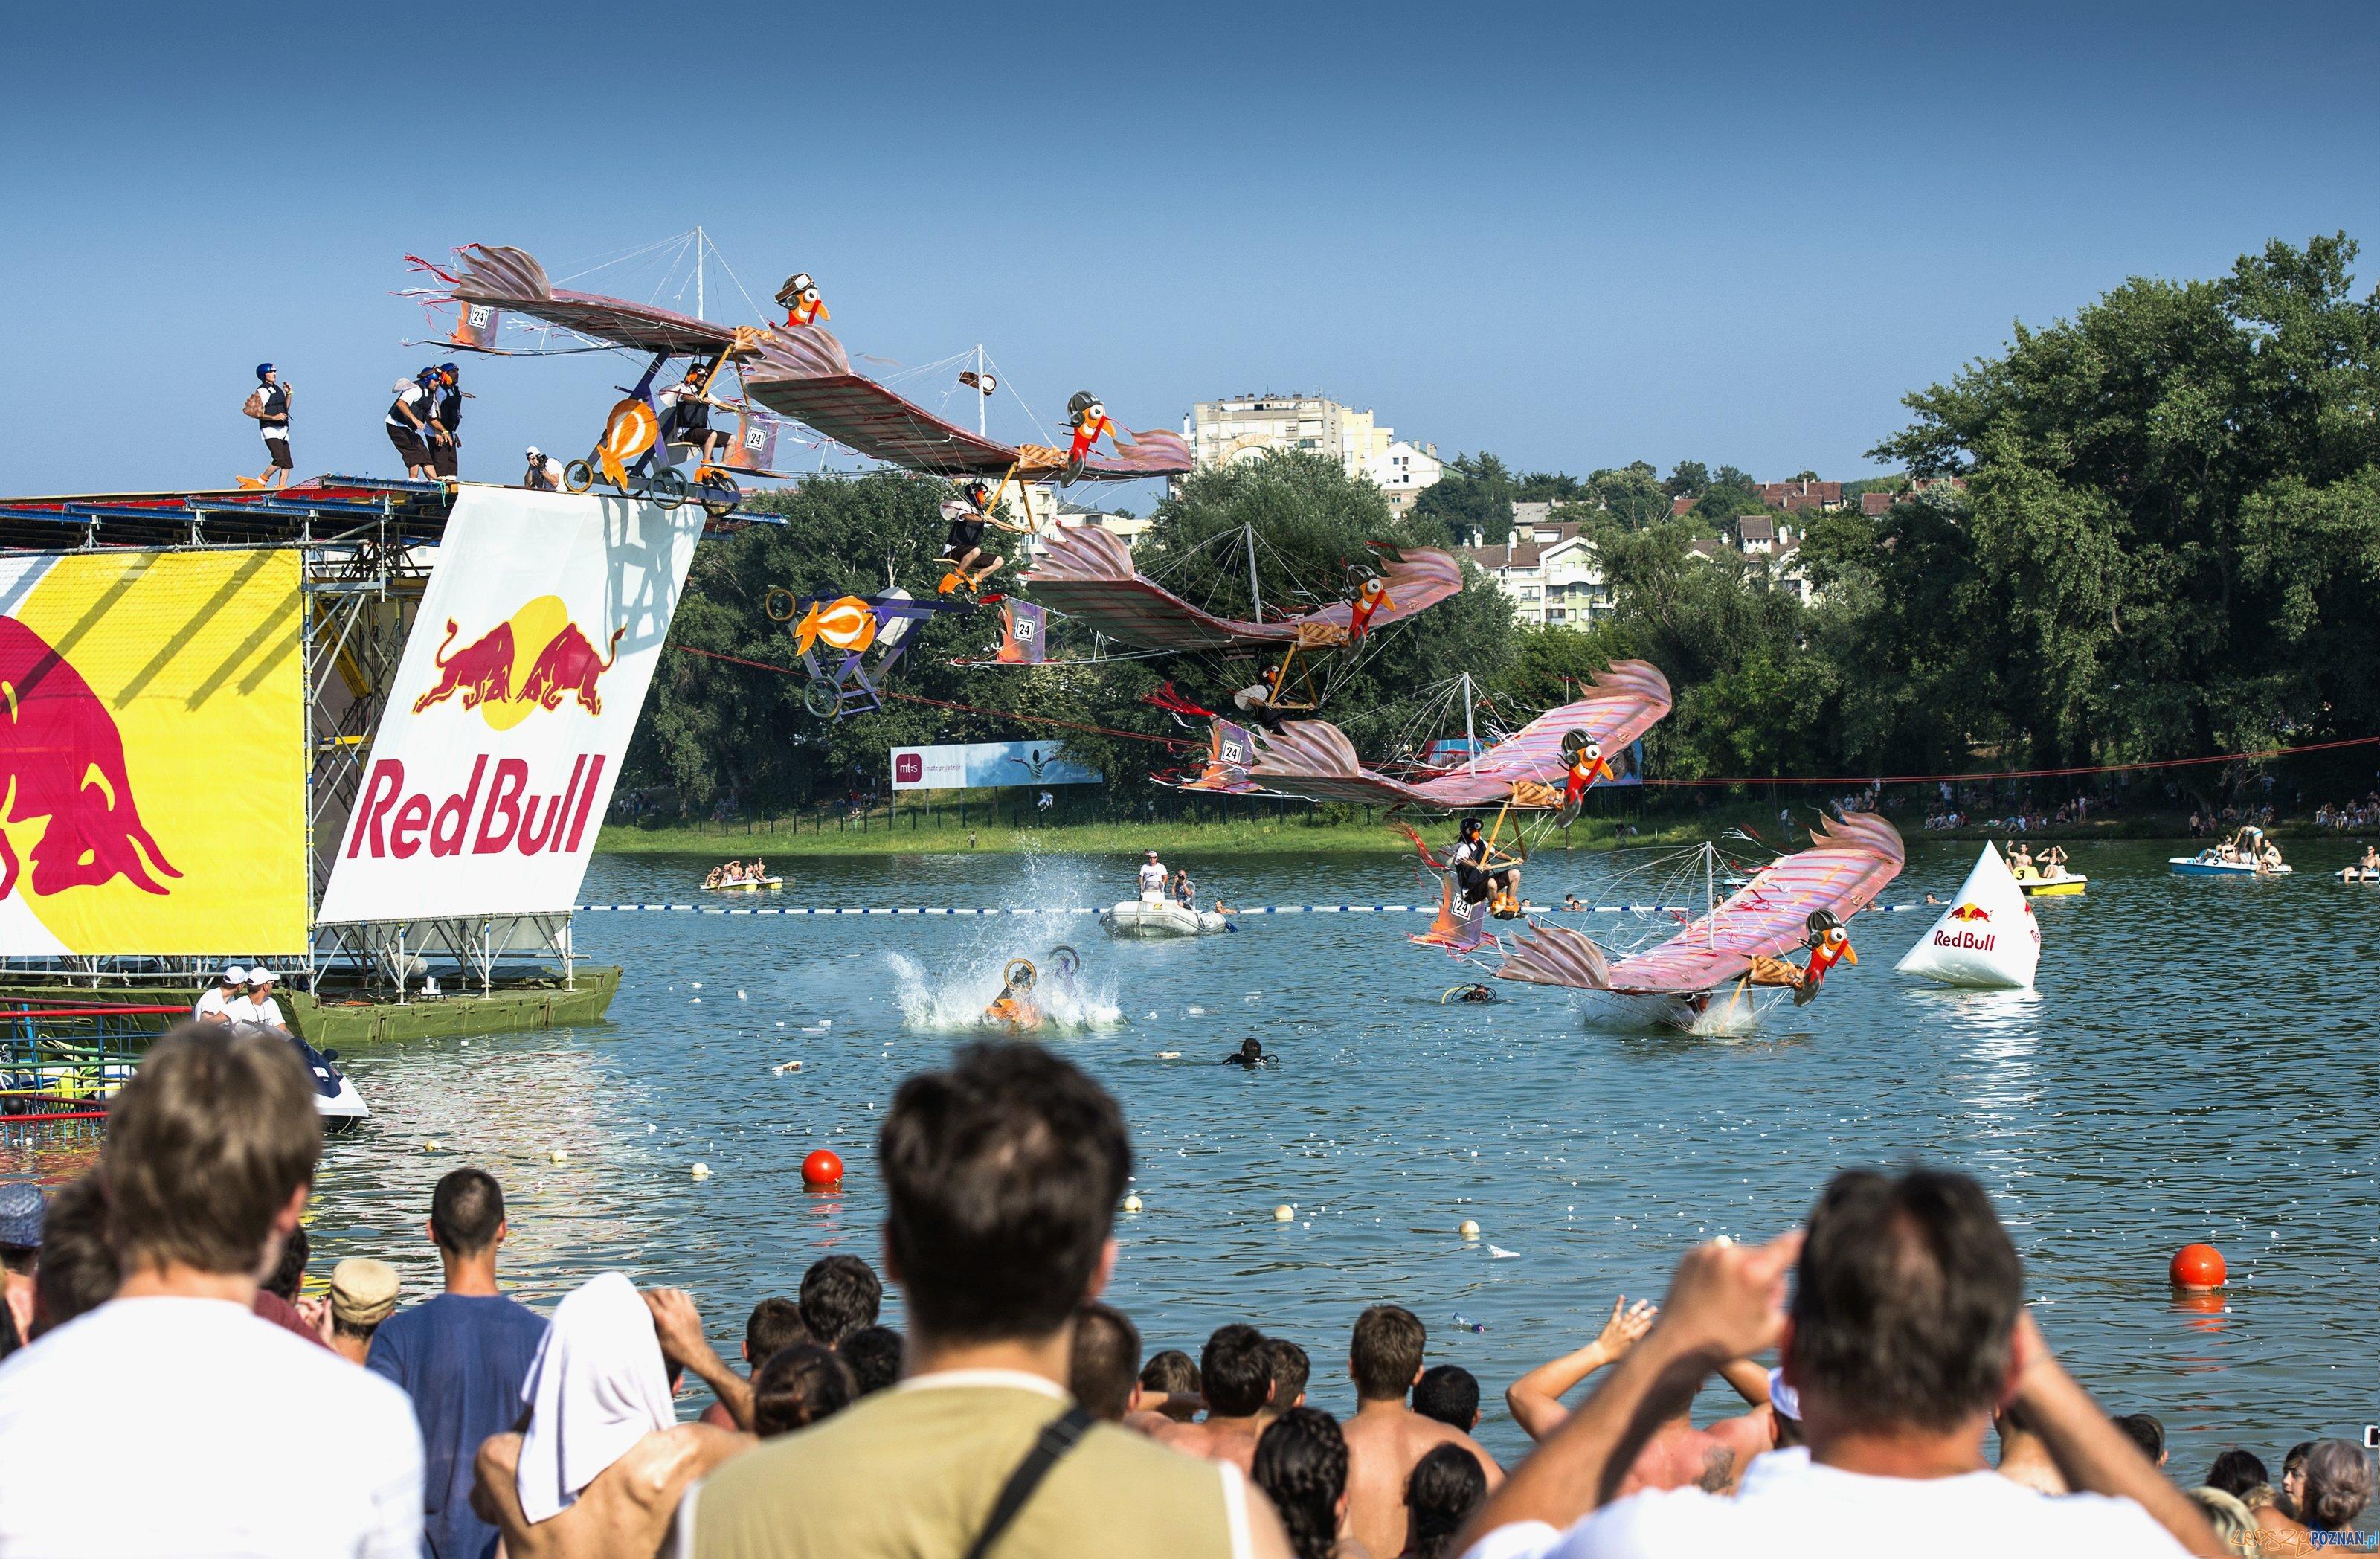 Konkurs Lotow Red Bull_Serbia_fot. Mihai Stetcu_Red Bull Content Pool  Foto: